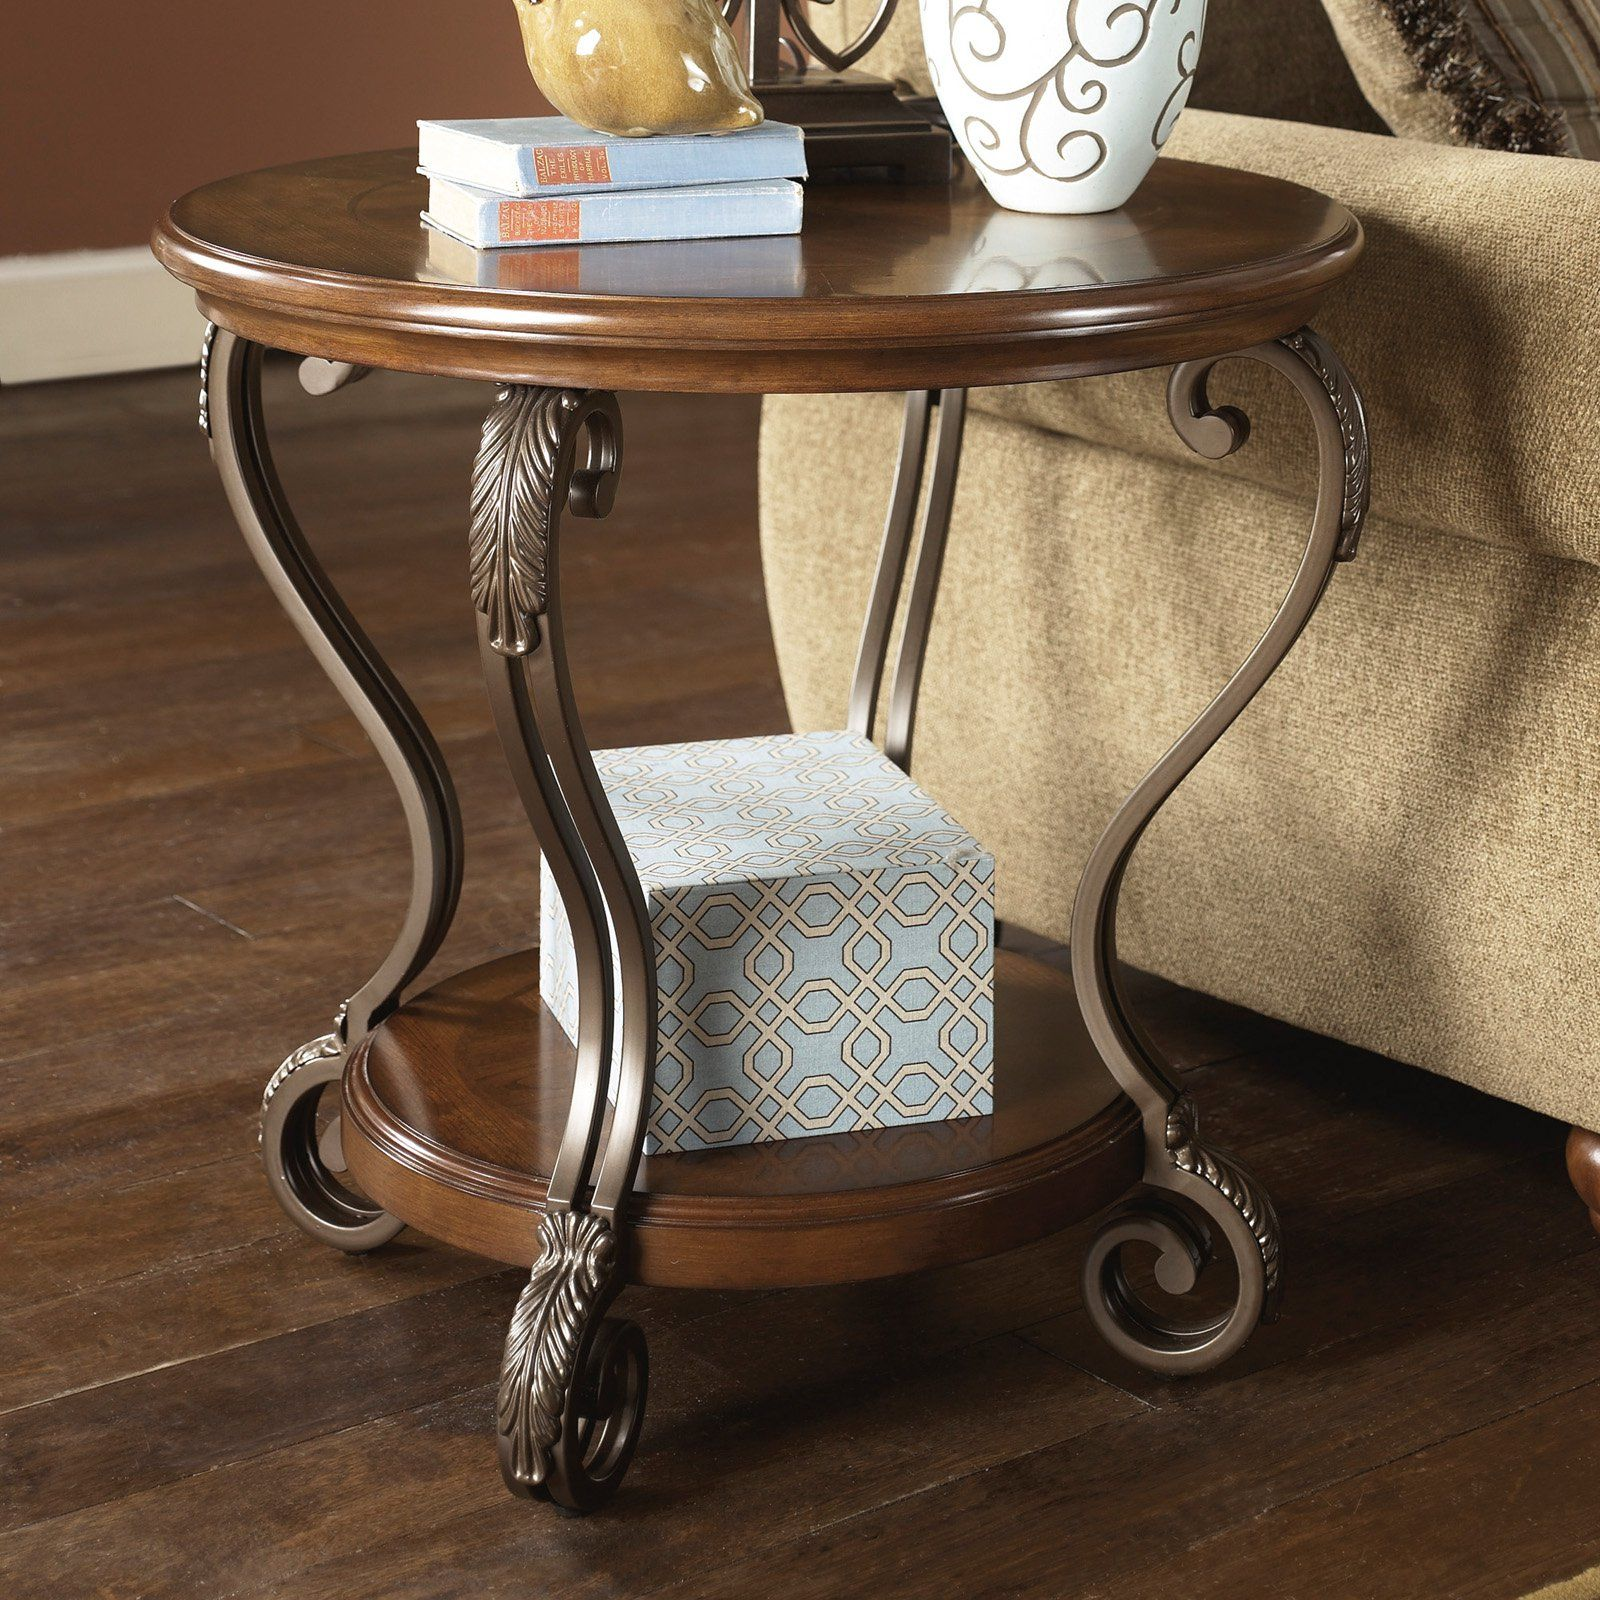 Remarkable Signature Design By Ashley Nestor Brown Round End Table Beutiful Home Inspiration Semekurdistantinfo